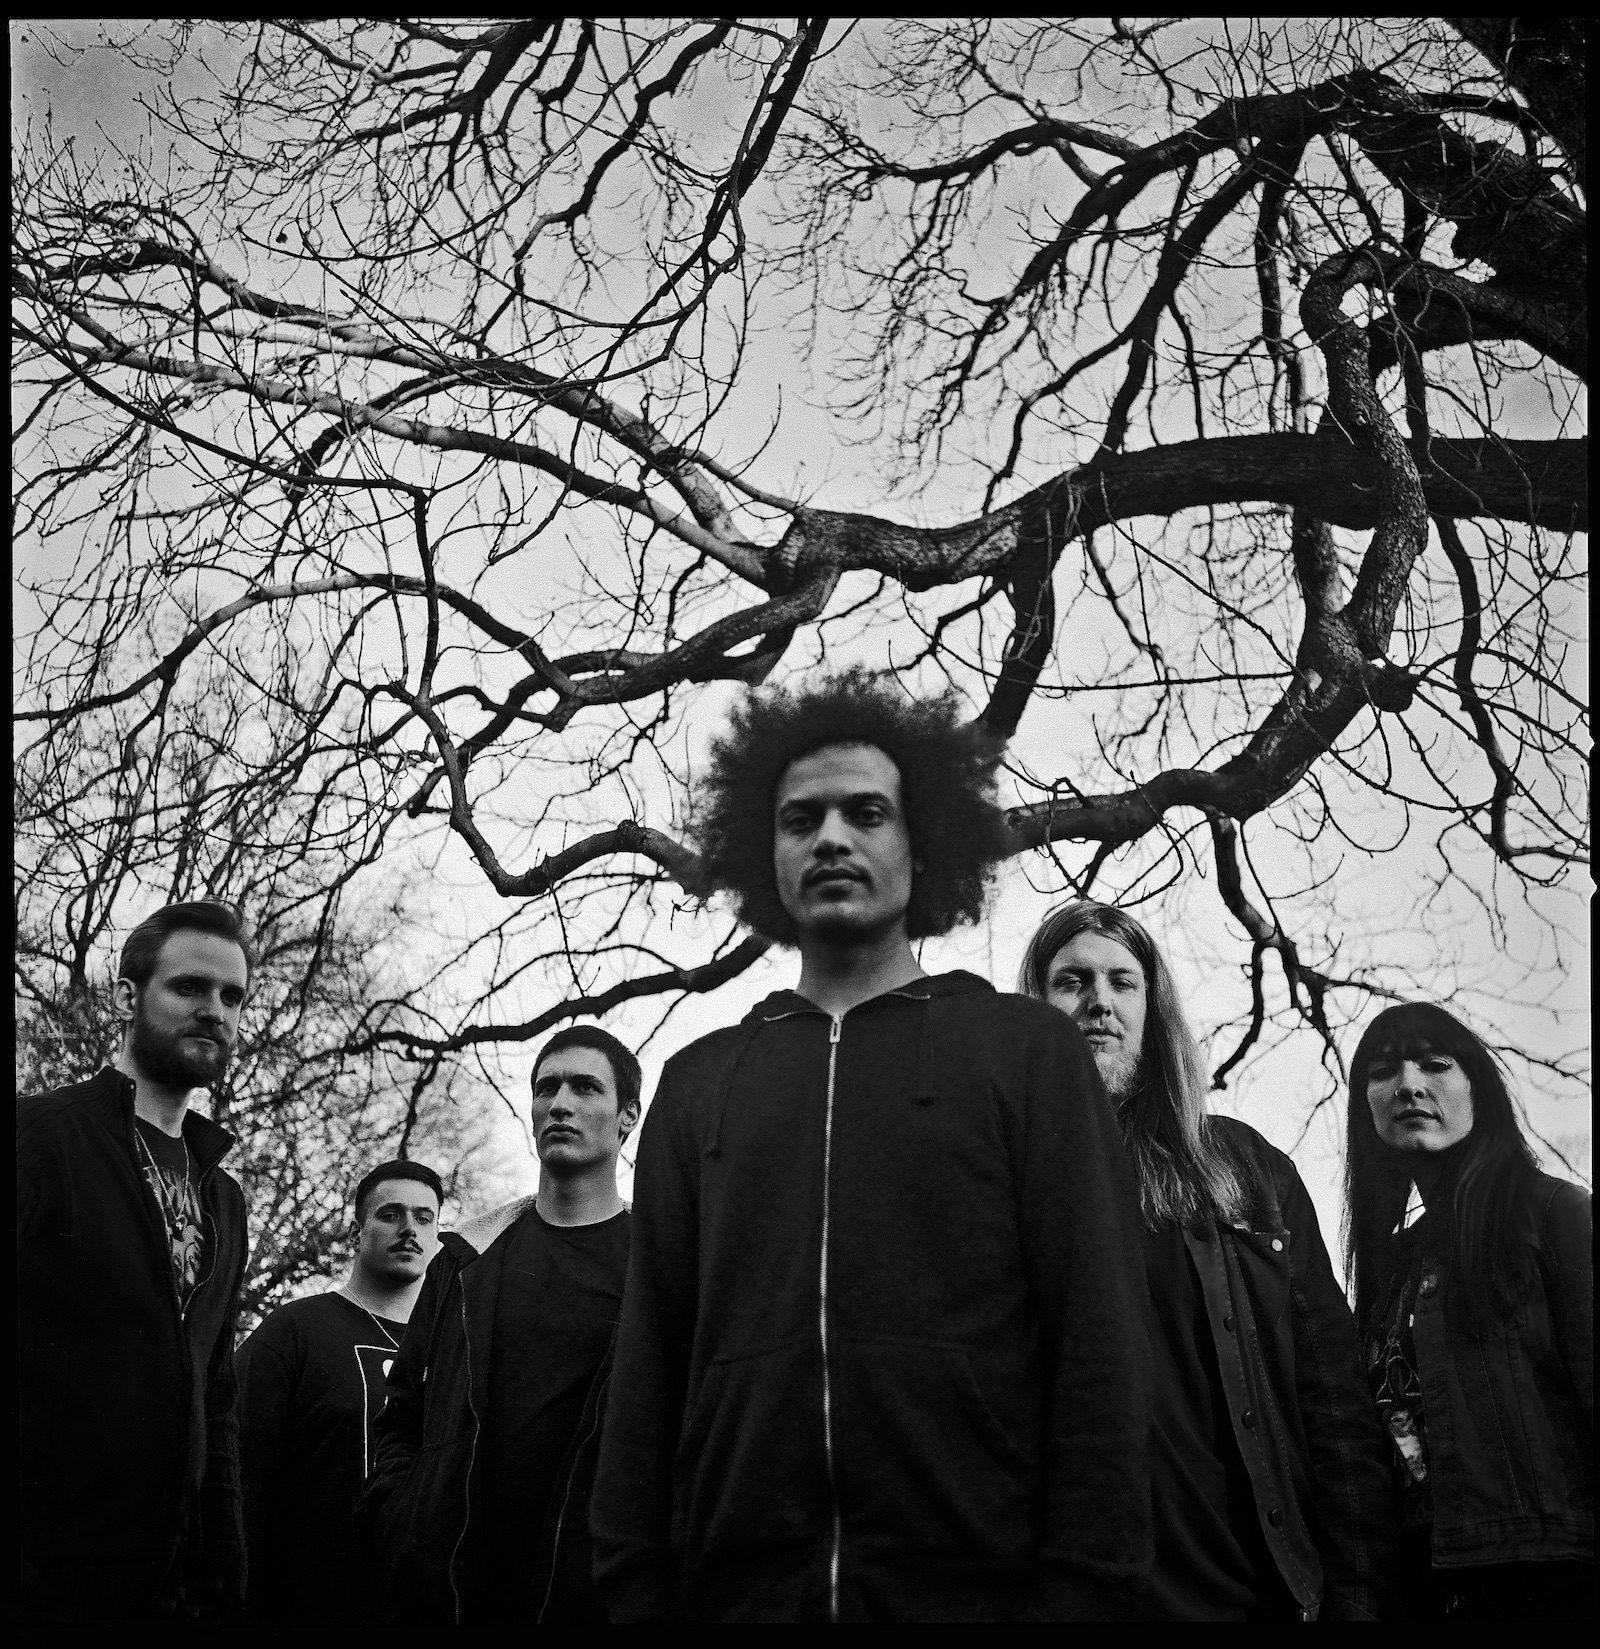 Zeal&Ardor - Band by Mehdi Benkler